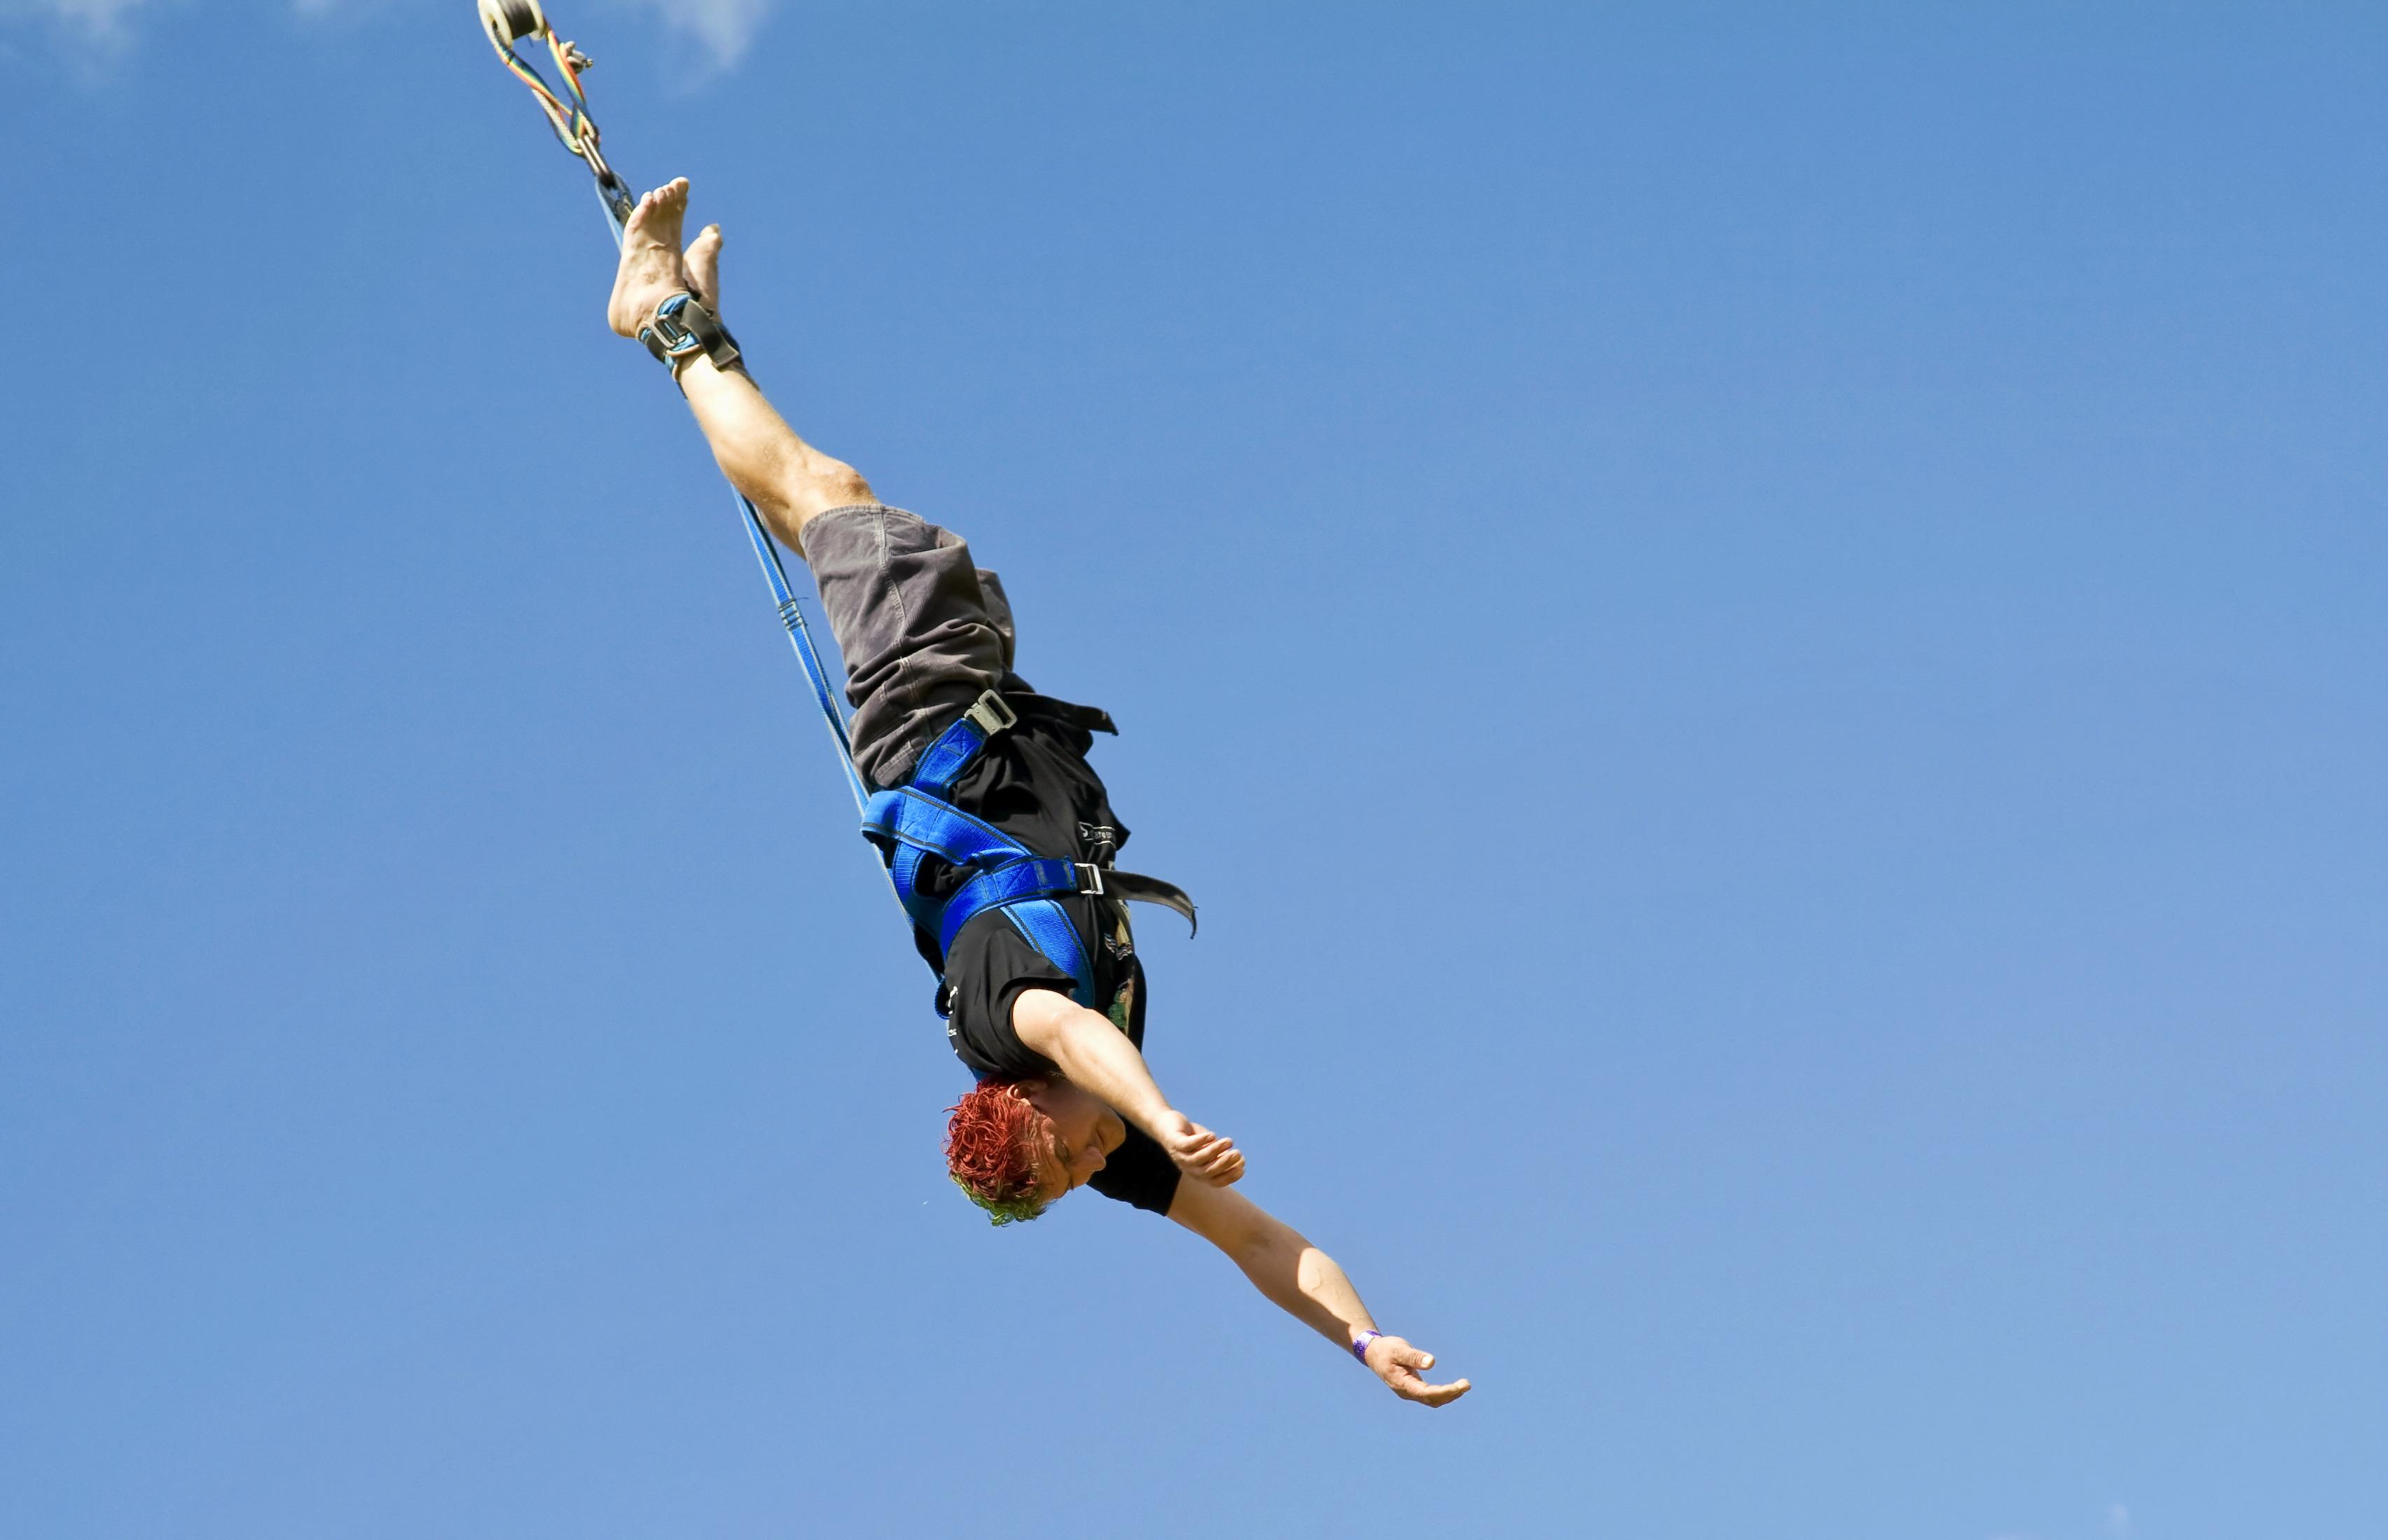 1579172978_bungee_jumping.jpg